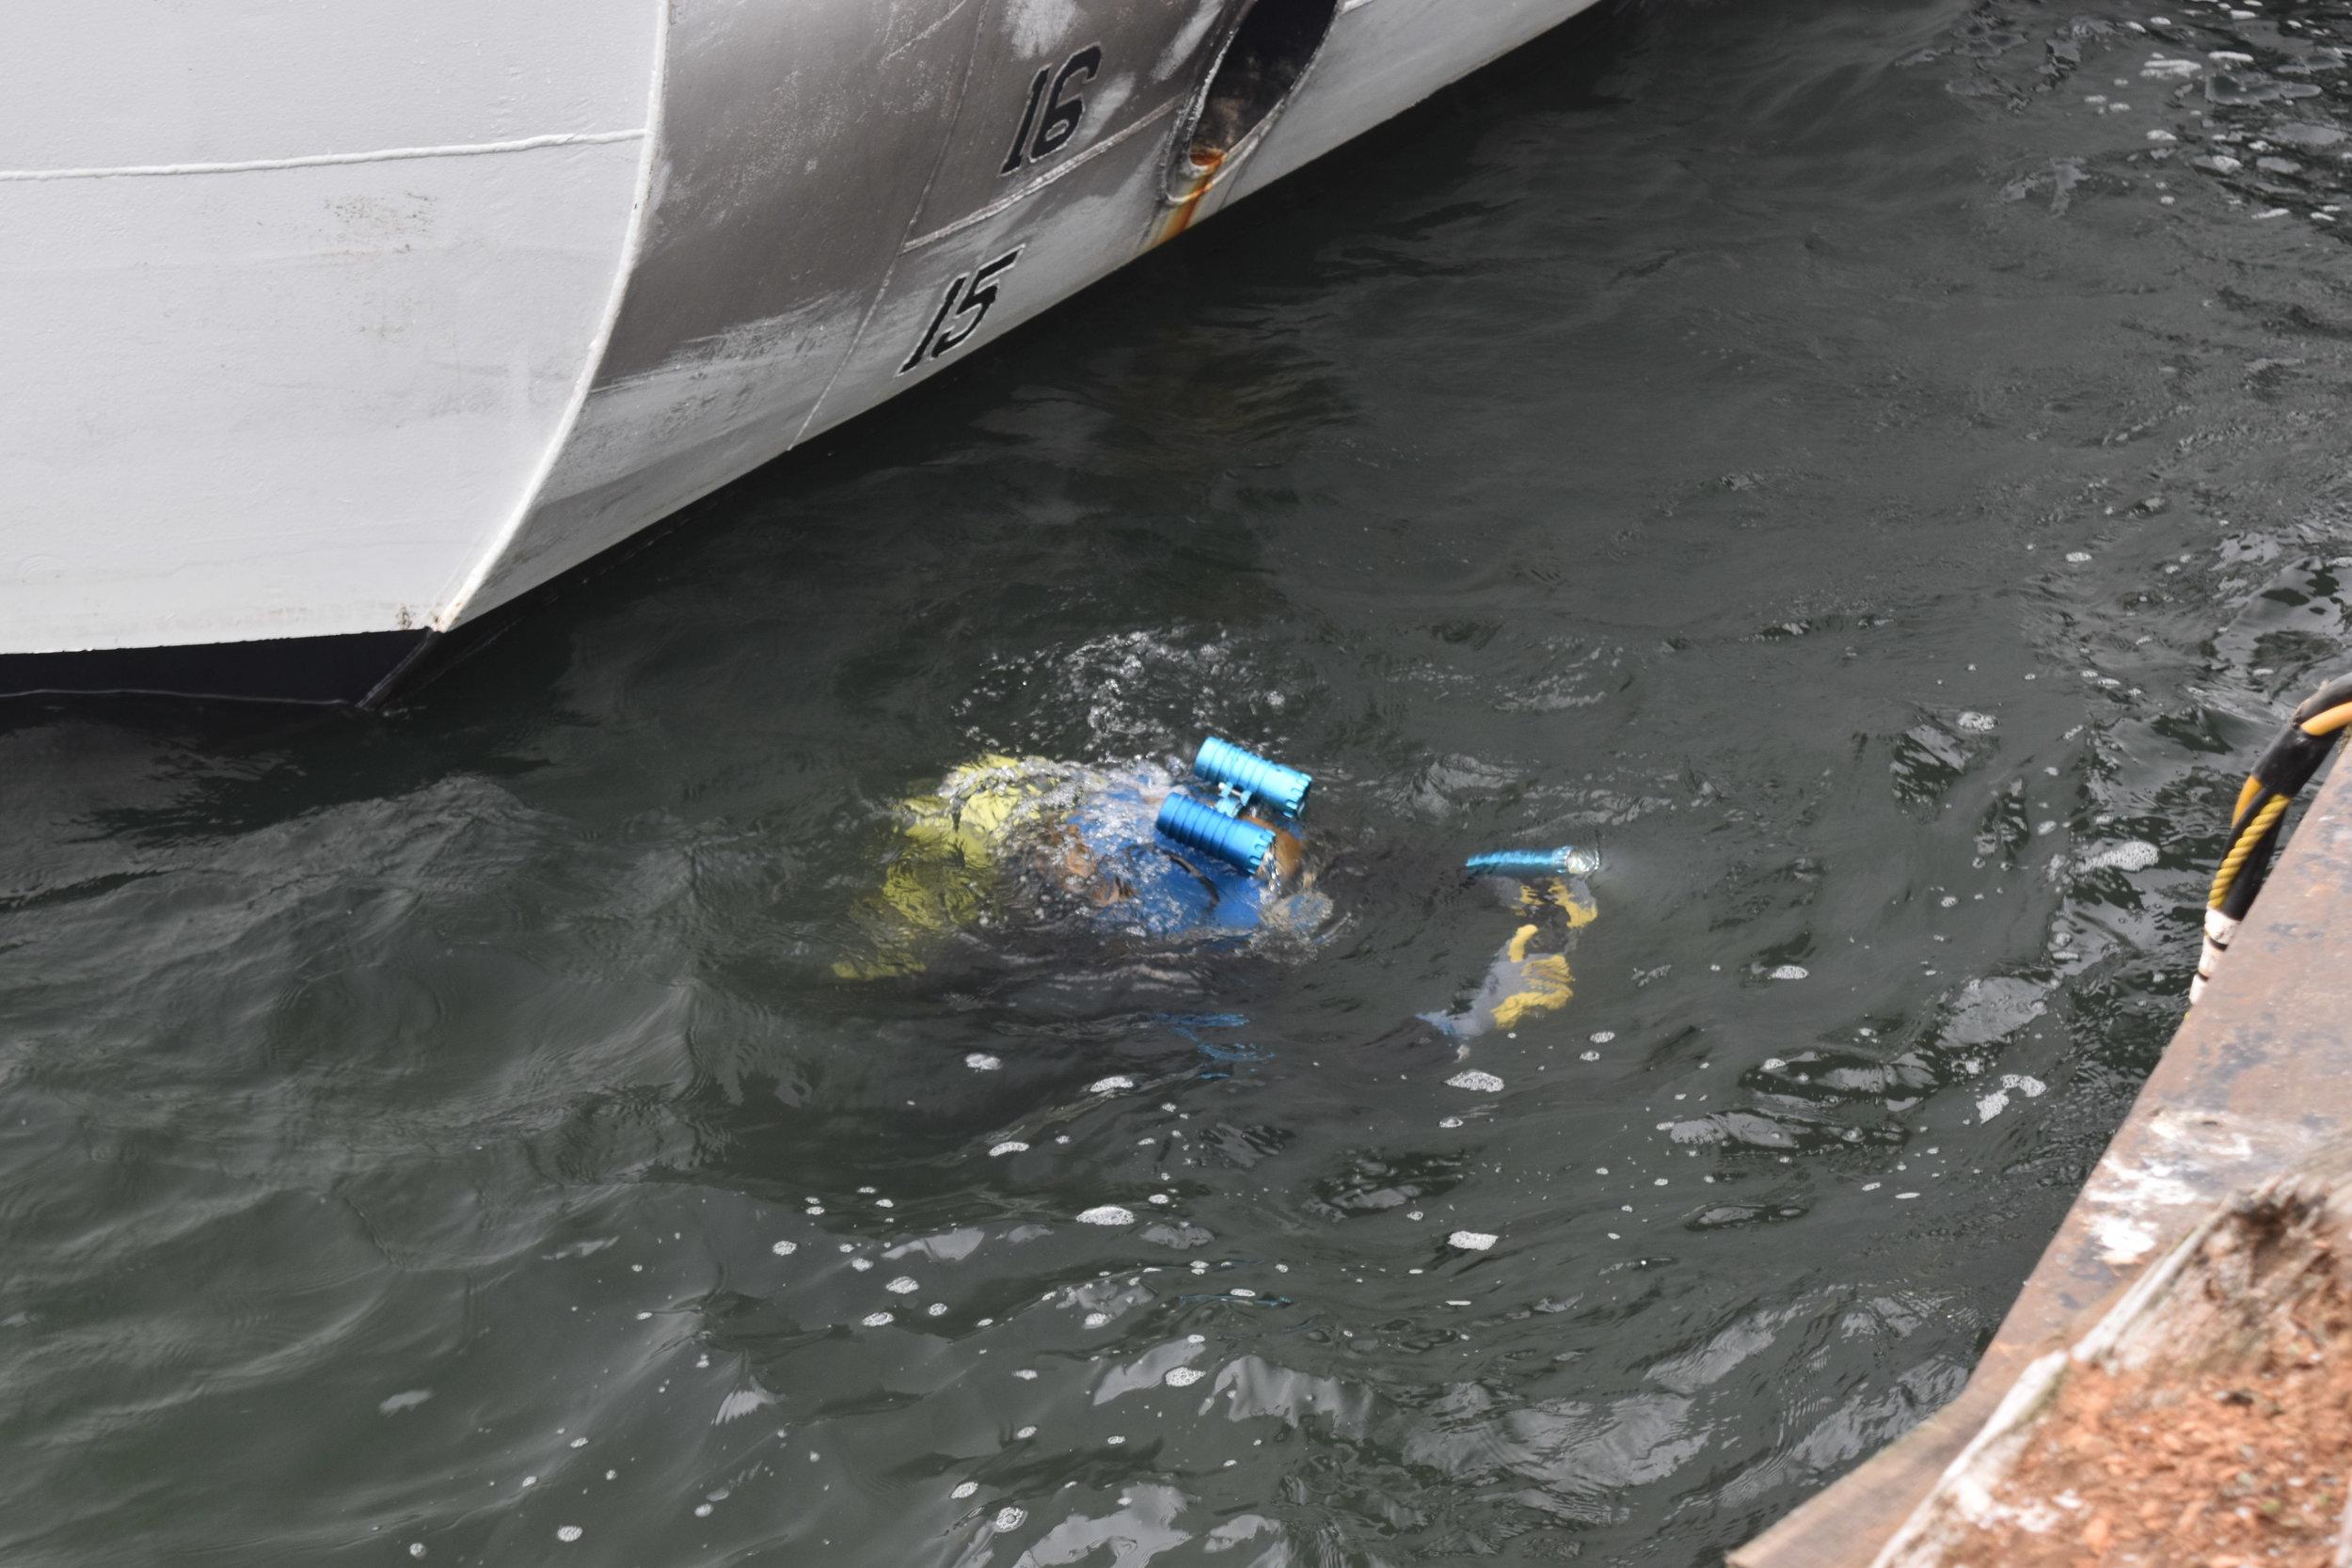 Inspecting a U.S. Coast Guard Vessel